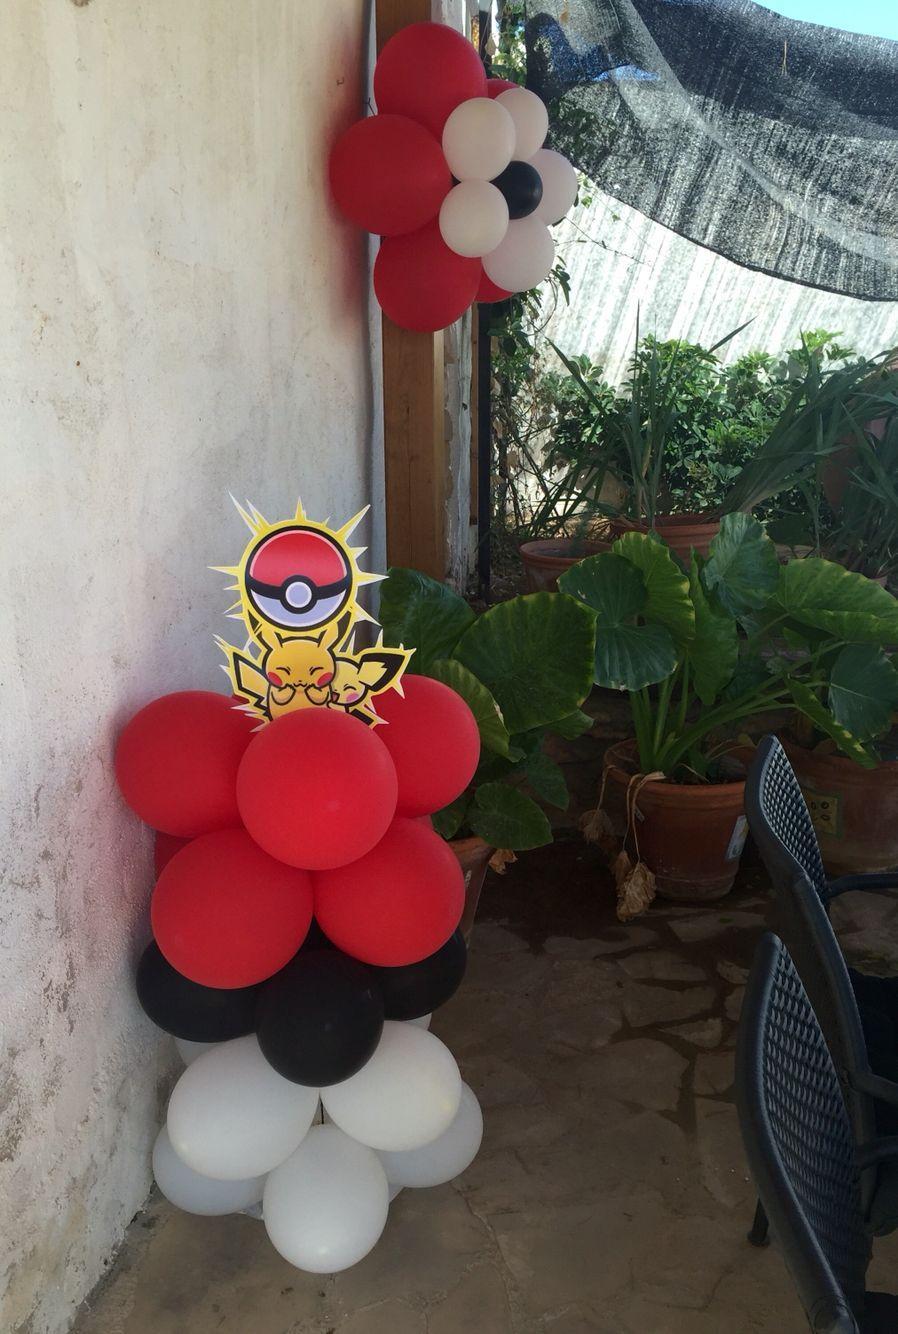 Pokemon fiesta decoraci n con globos pikachu fiestas - Globos fiesta cumpleanos ...